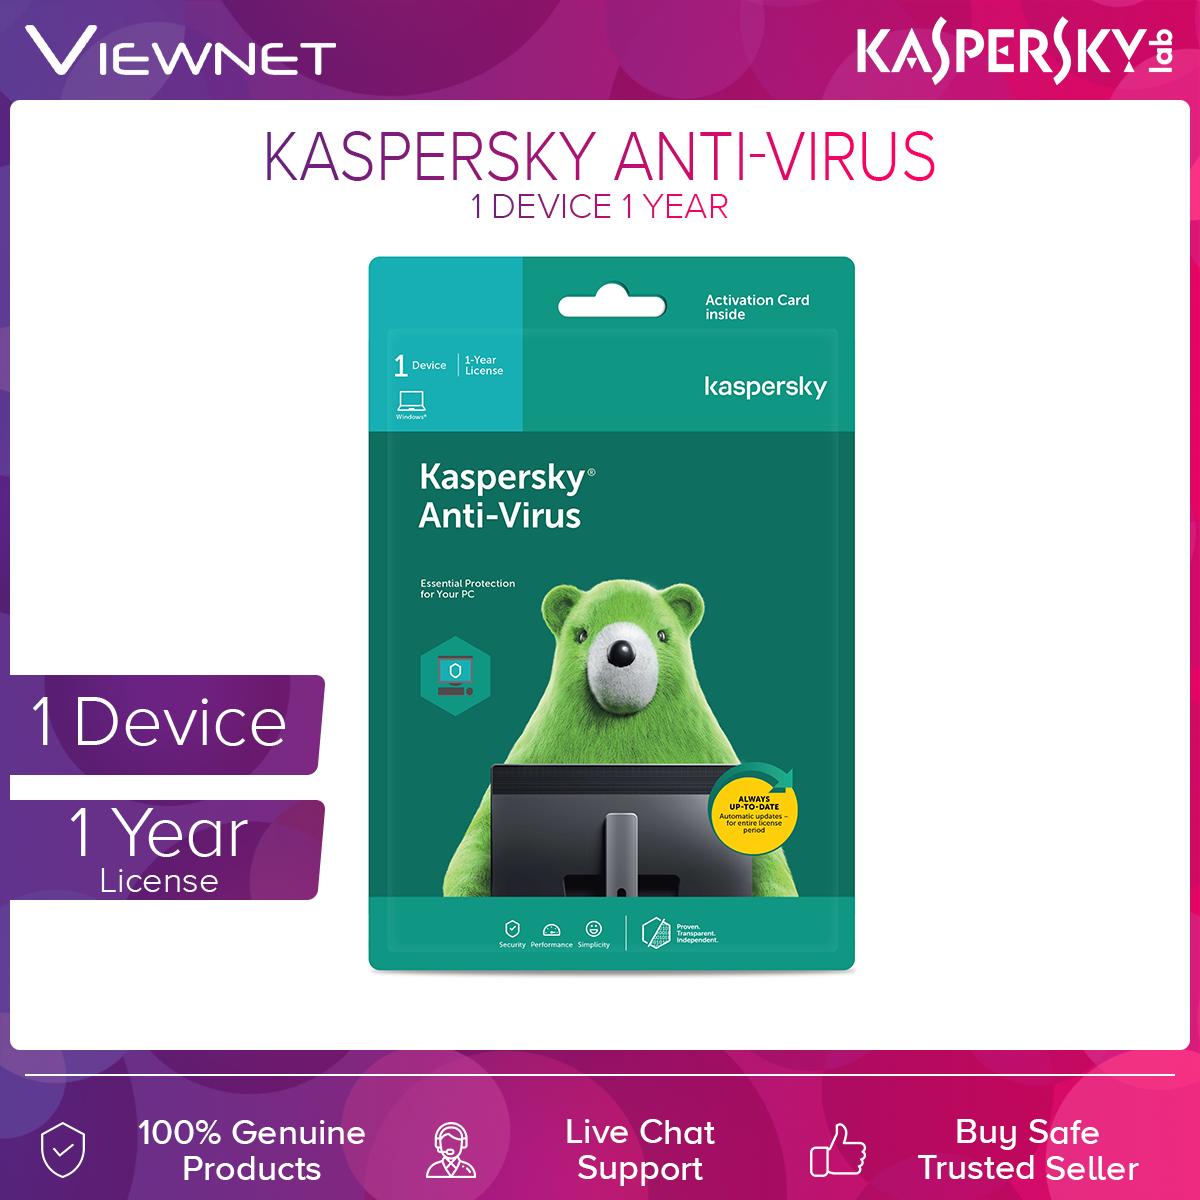 Kaspersky Anti-Virus 1 Device 1 Year License